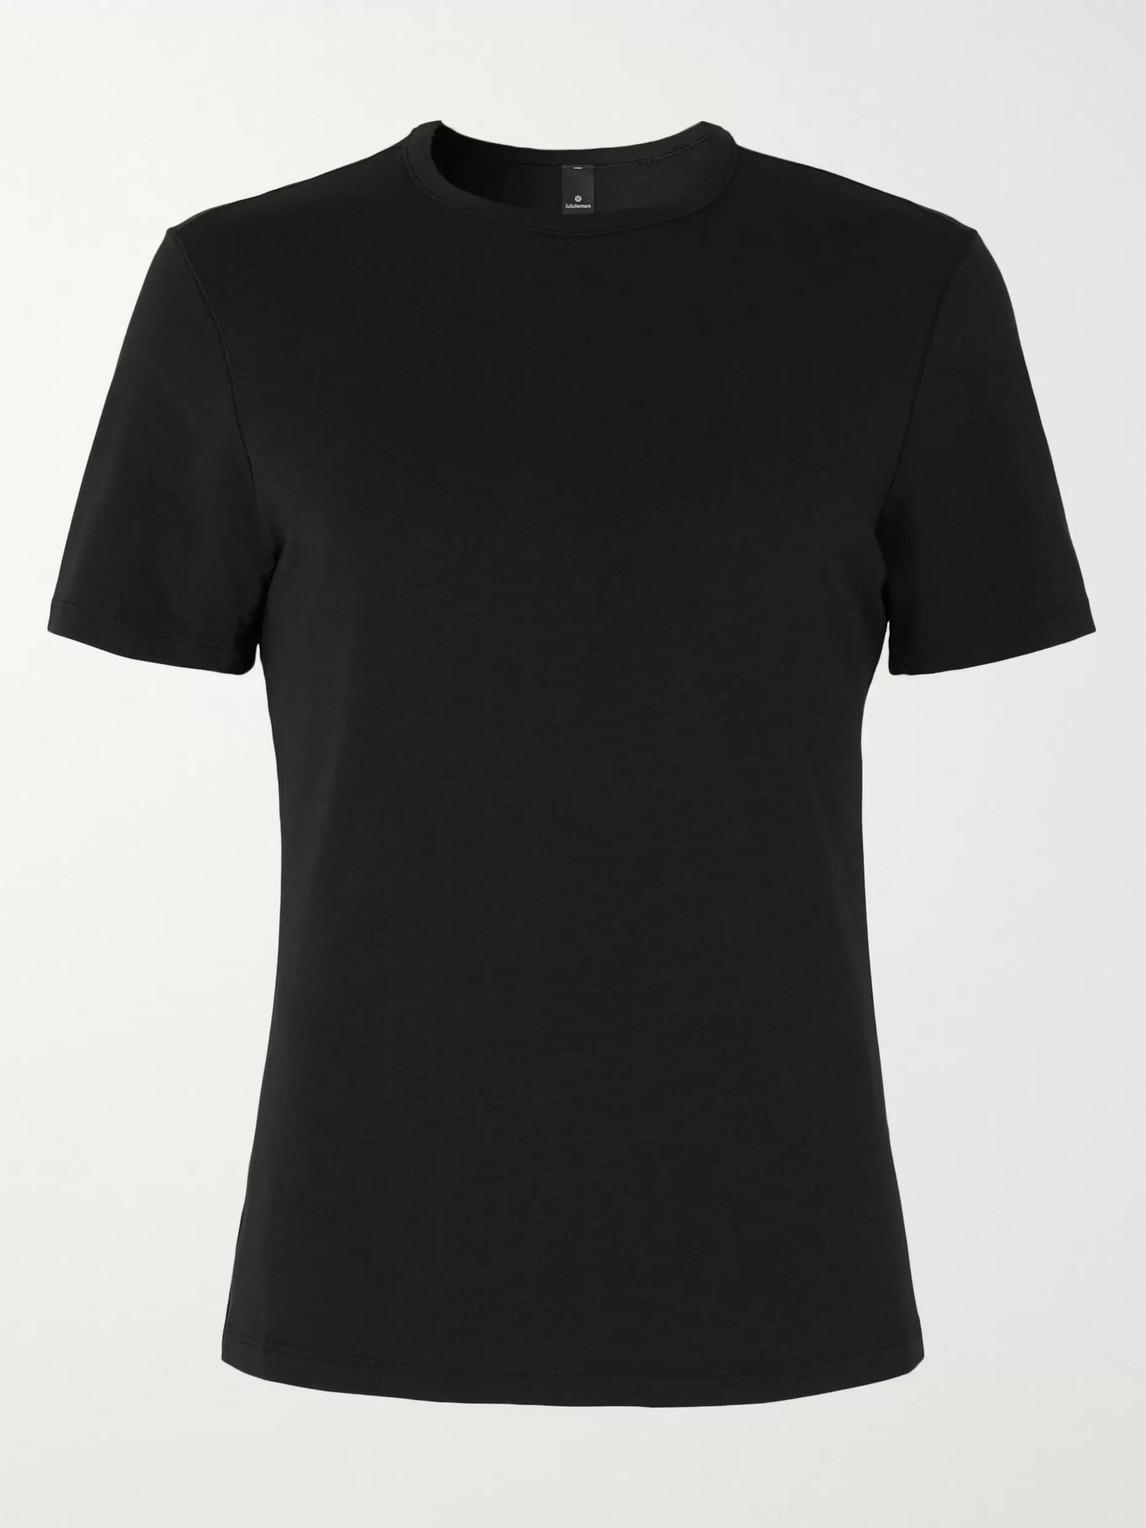 lululemon - 5-year basic vitasea t-shirt - men - black